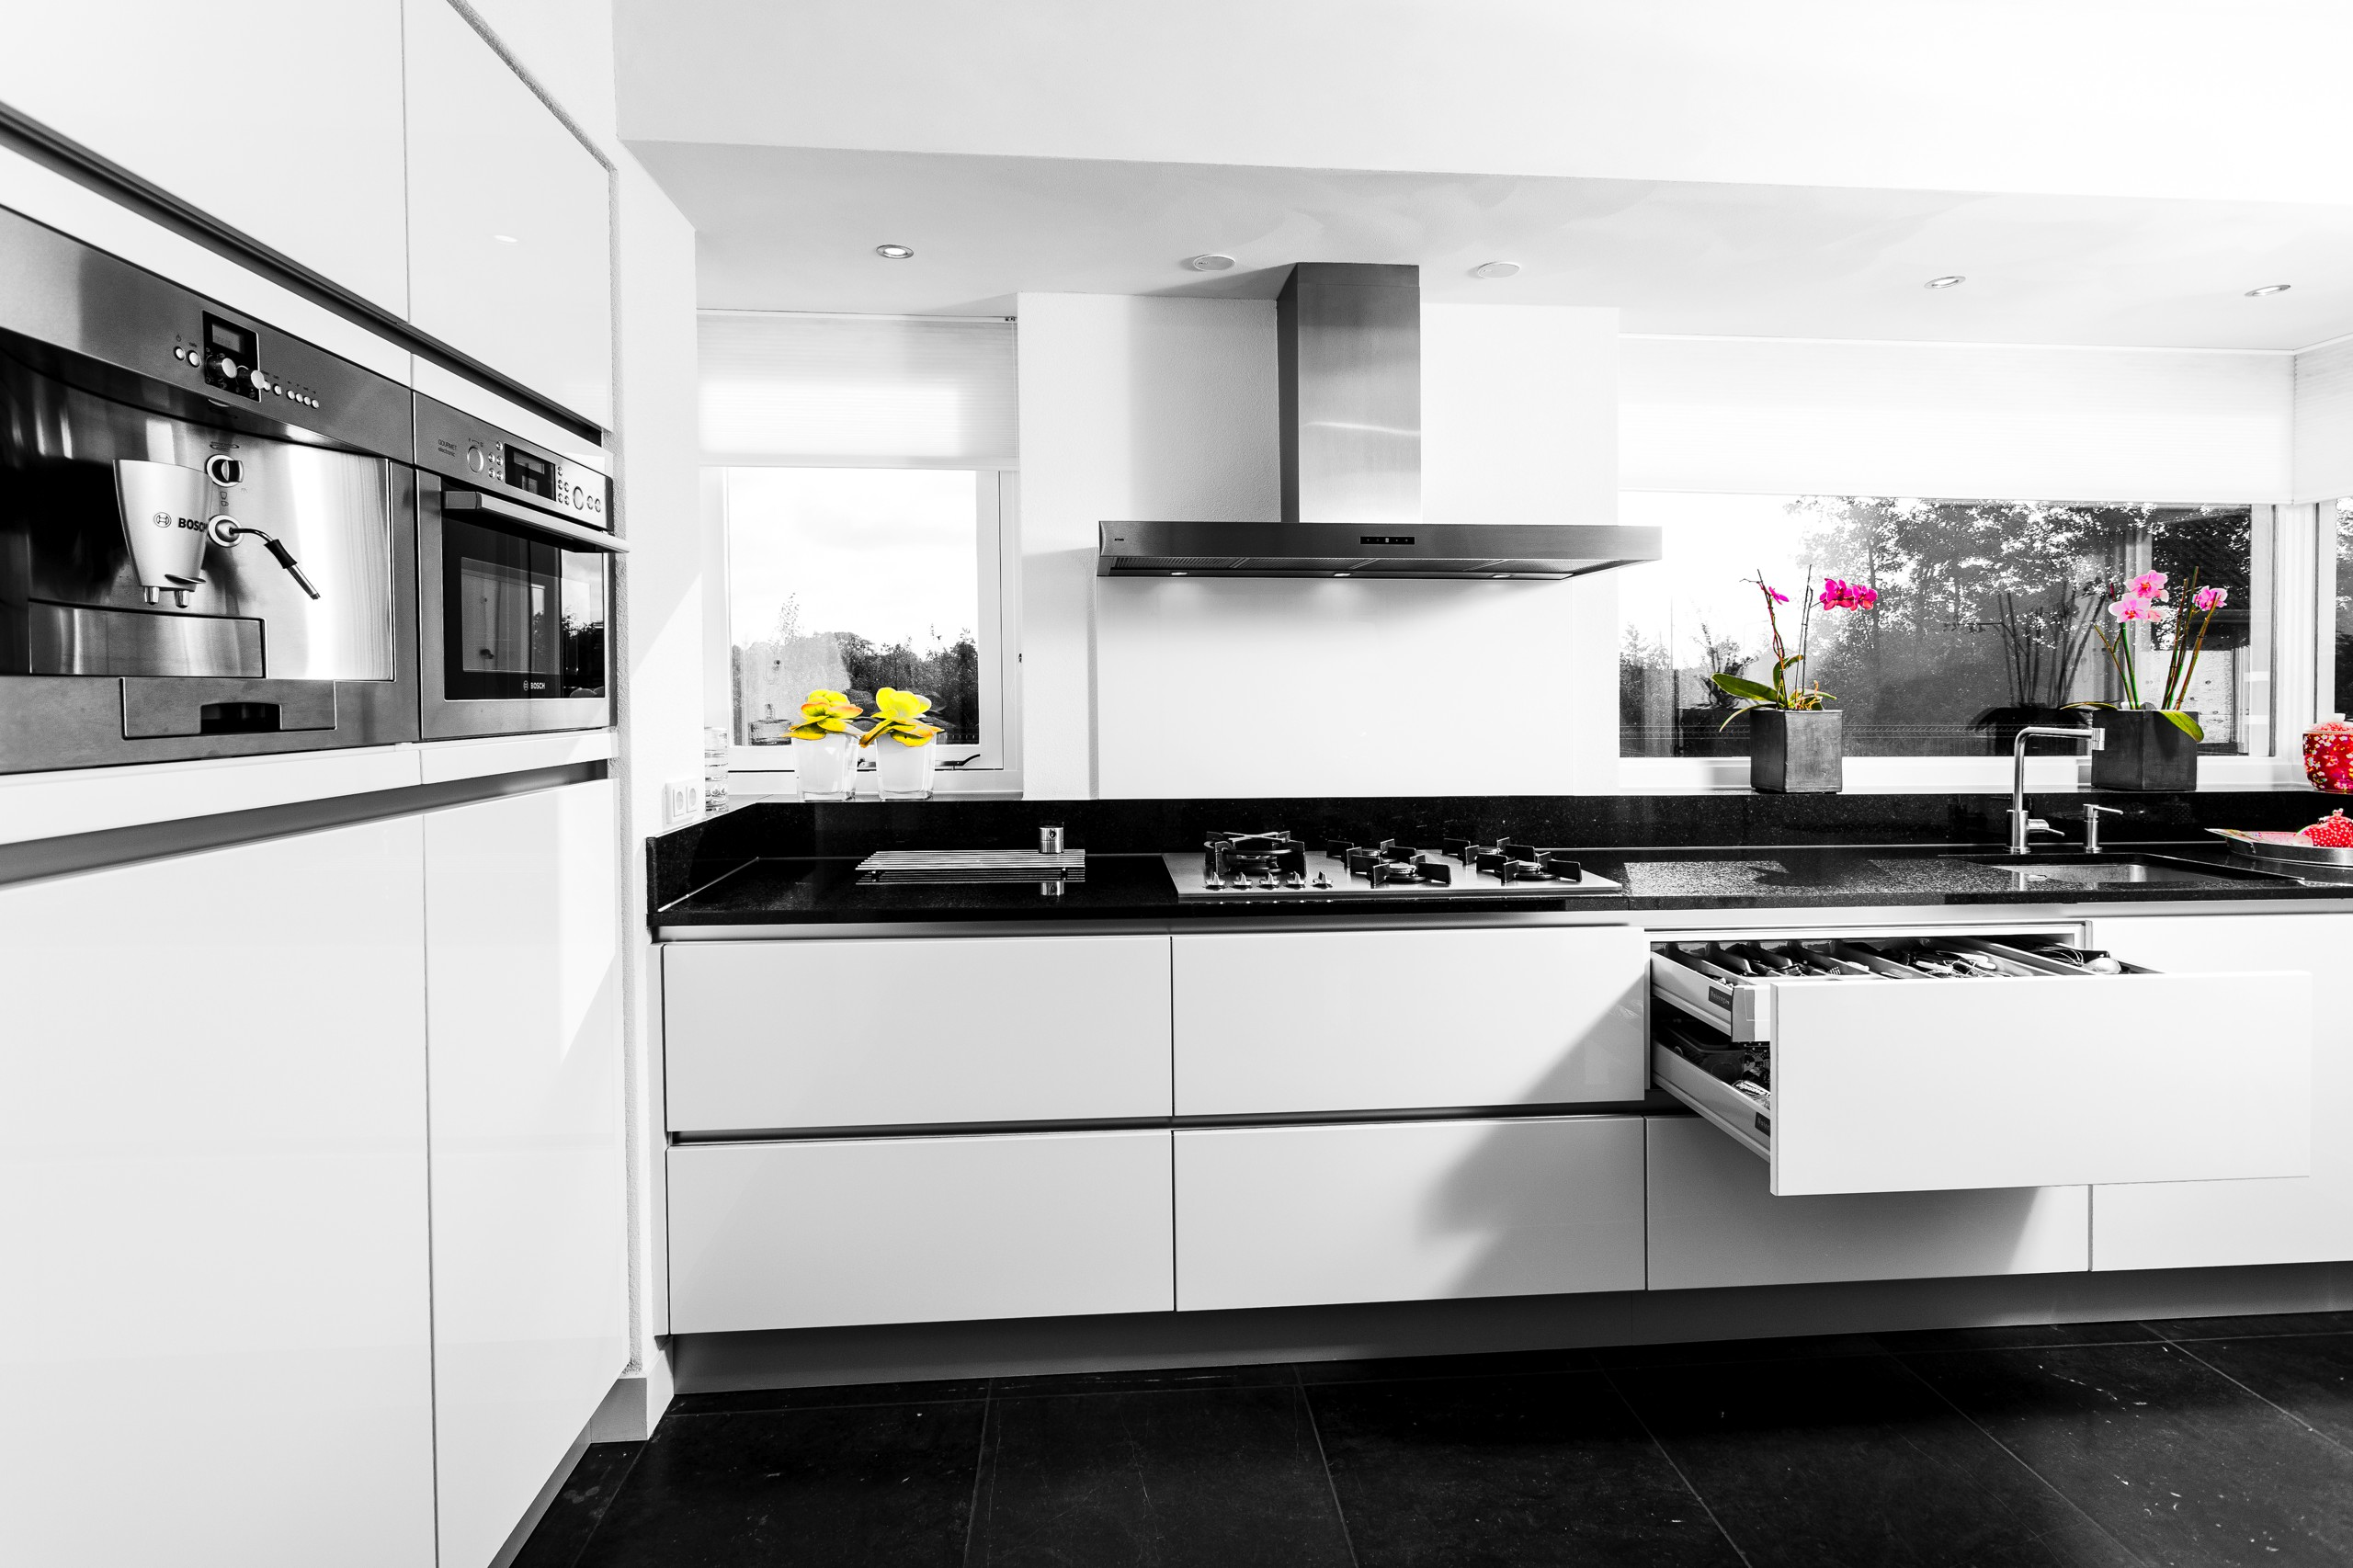 welke kleur vloer bij witte hoogglans keuken tg wonen woonmagazine